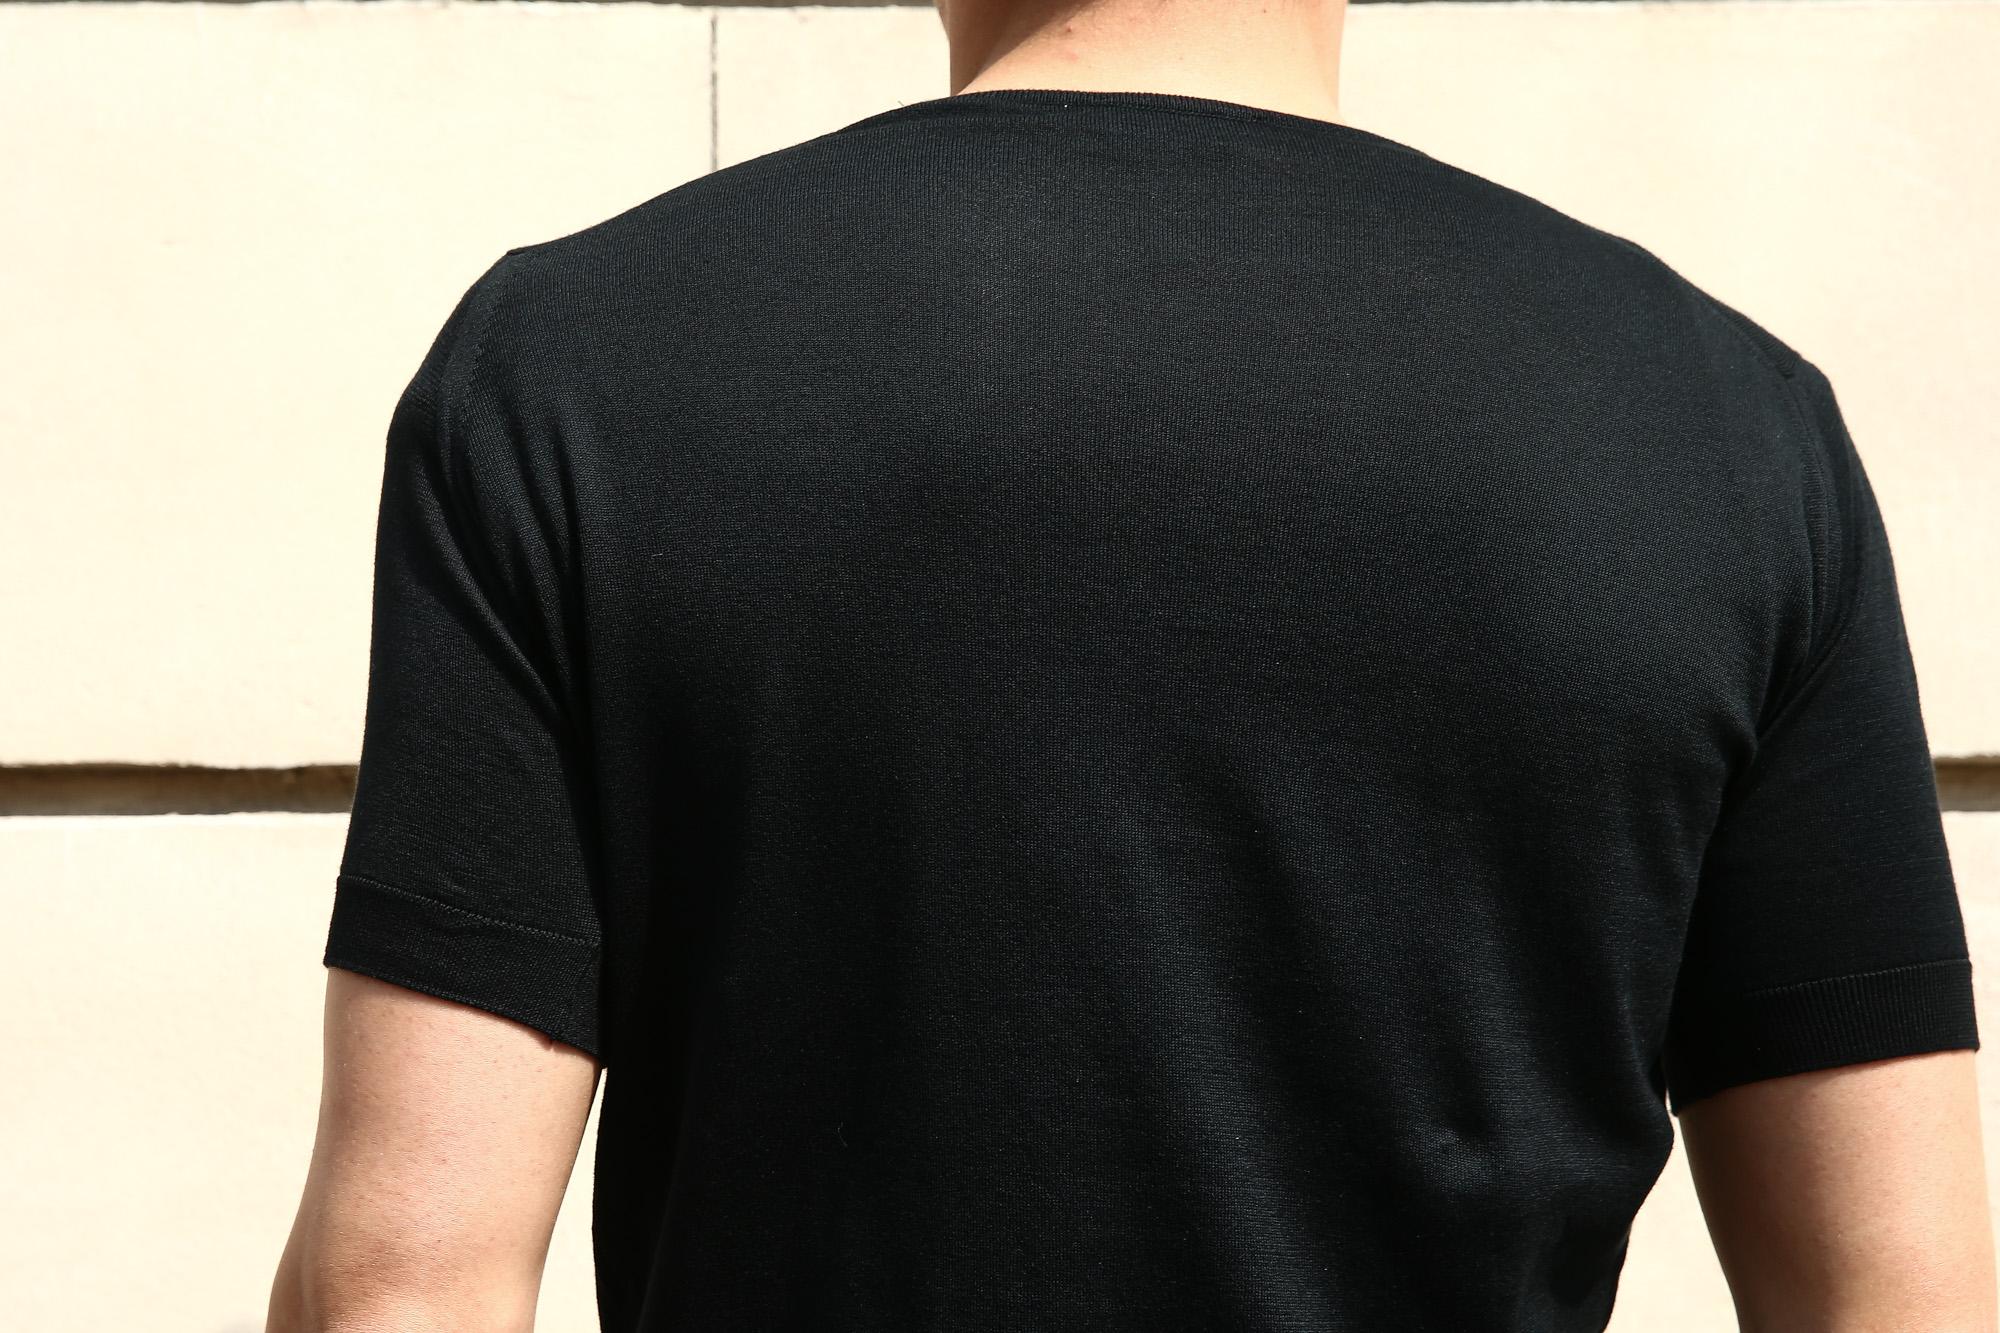 JOHN SMEDLEY (ジョンスメドレー) BELDEN (ベルデン) SEA ISLAND COTTON (シーアイランドコットン) ショートスリーブ コットンニット Tシャツ BLACK (ブラック) Made in England (イギリス製) 2018 春夏新作 johnsmedley スメドレー 愛知 名古屋 ZODIAC ゾディアック ニットTEE